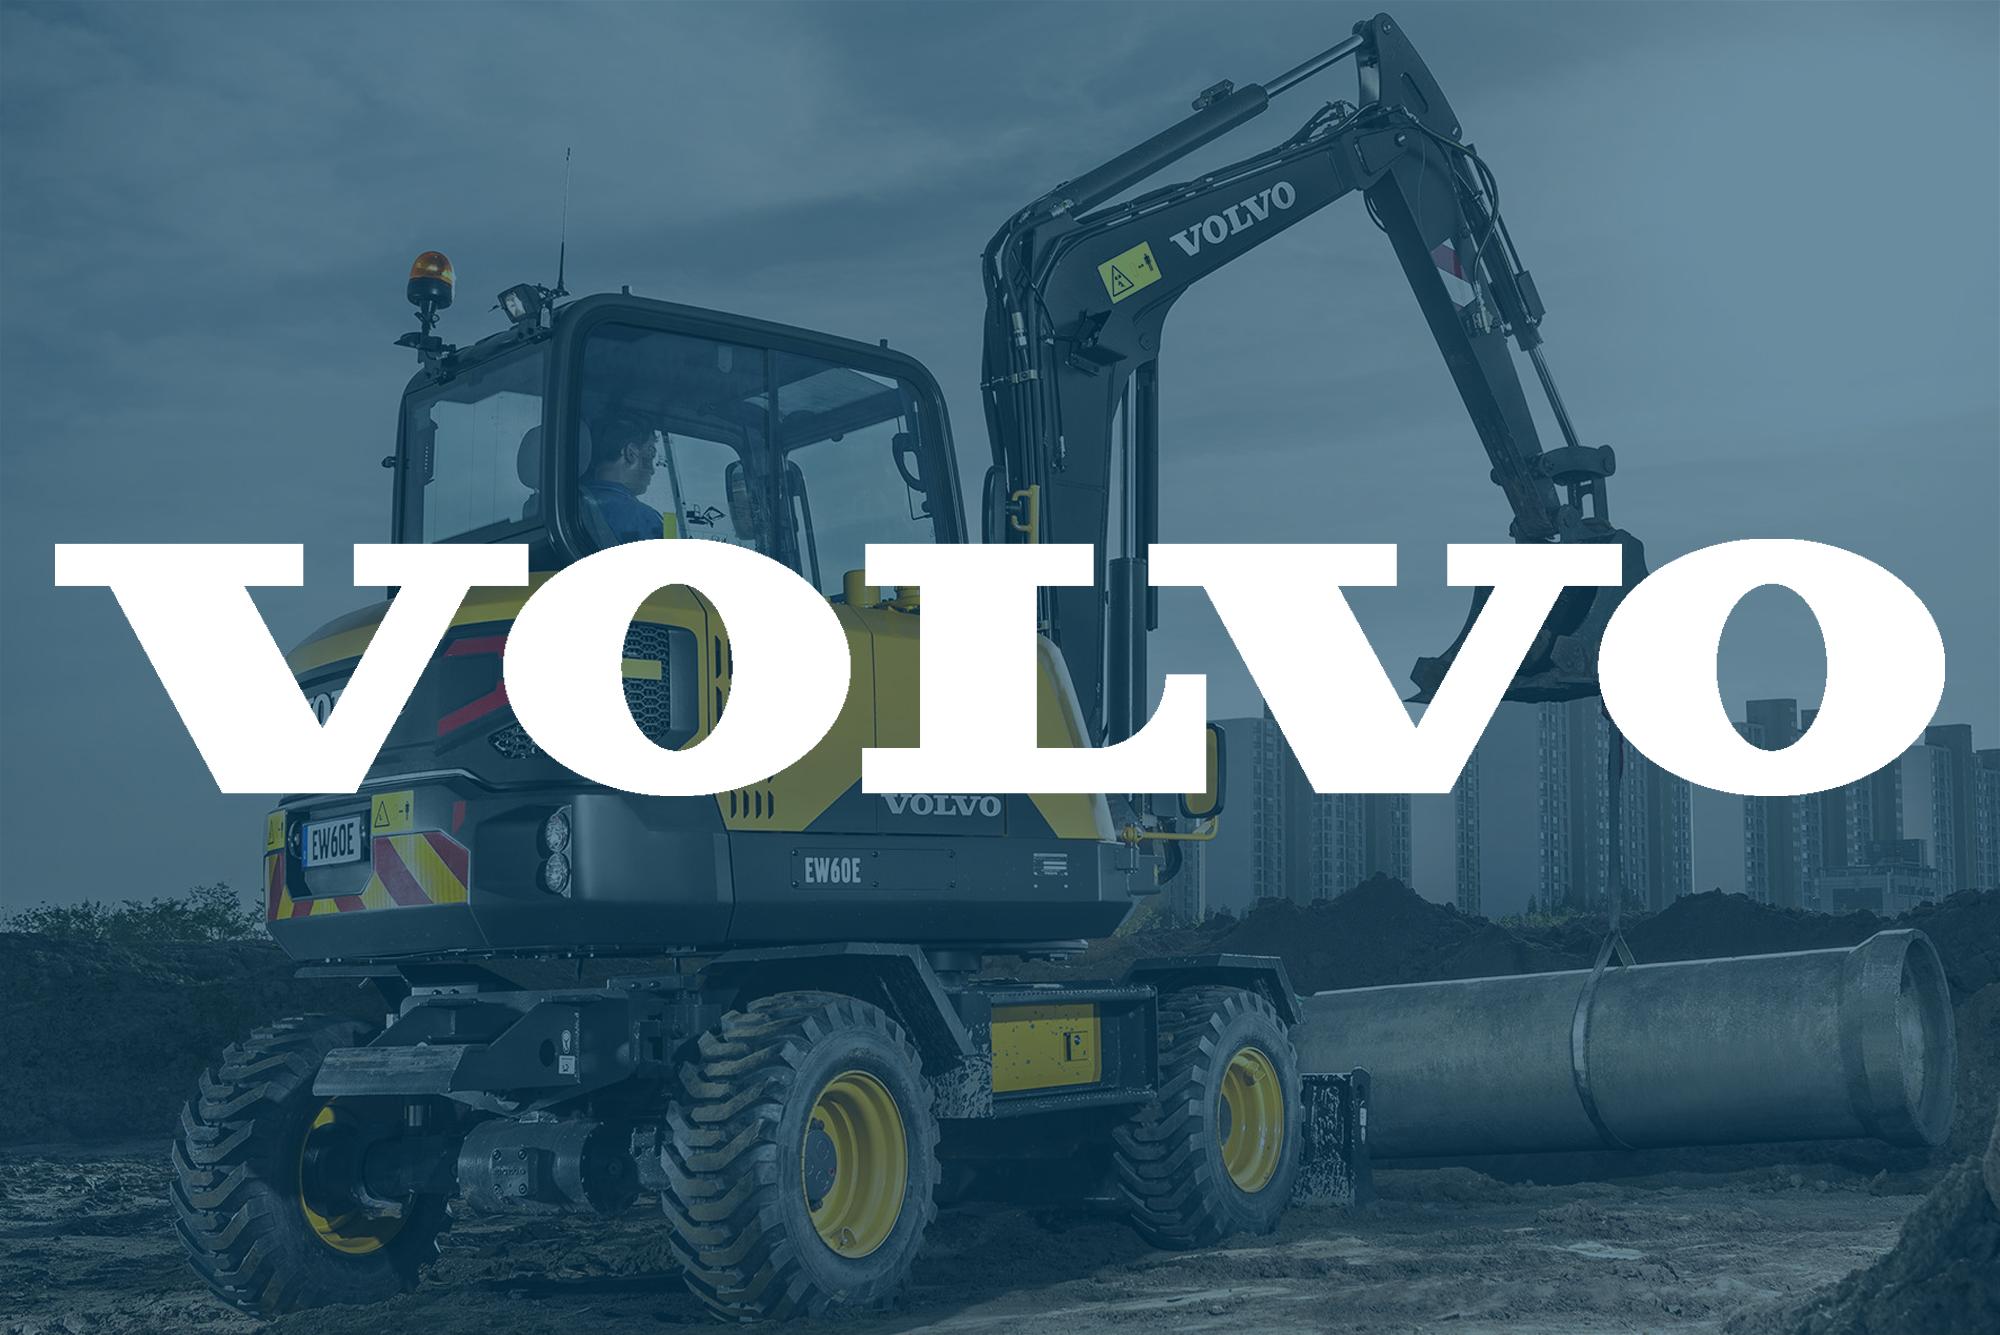 Volvo marques partenaires cimme